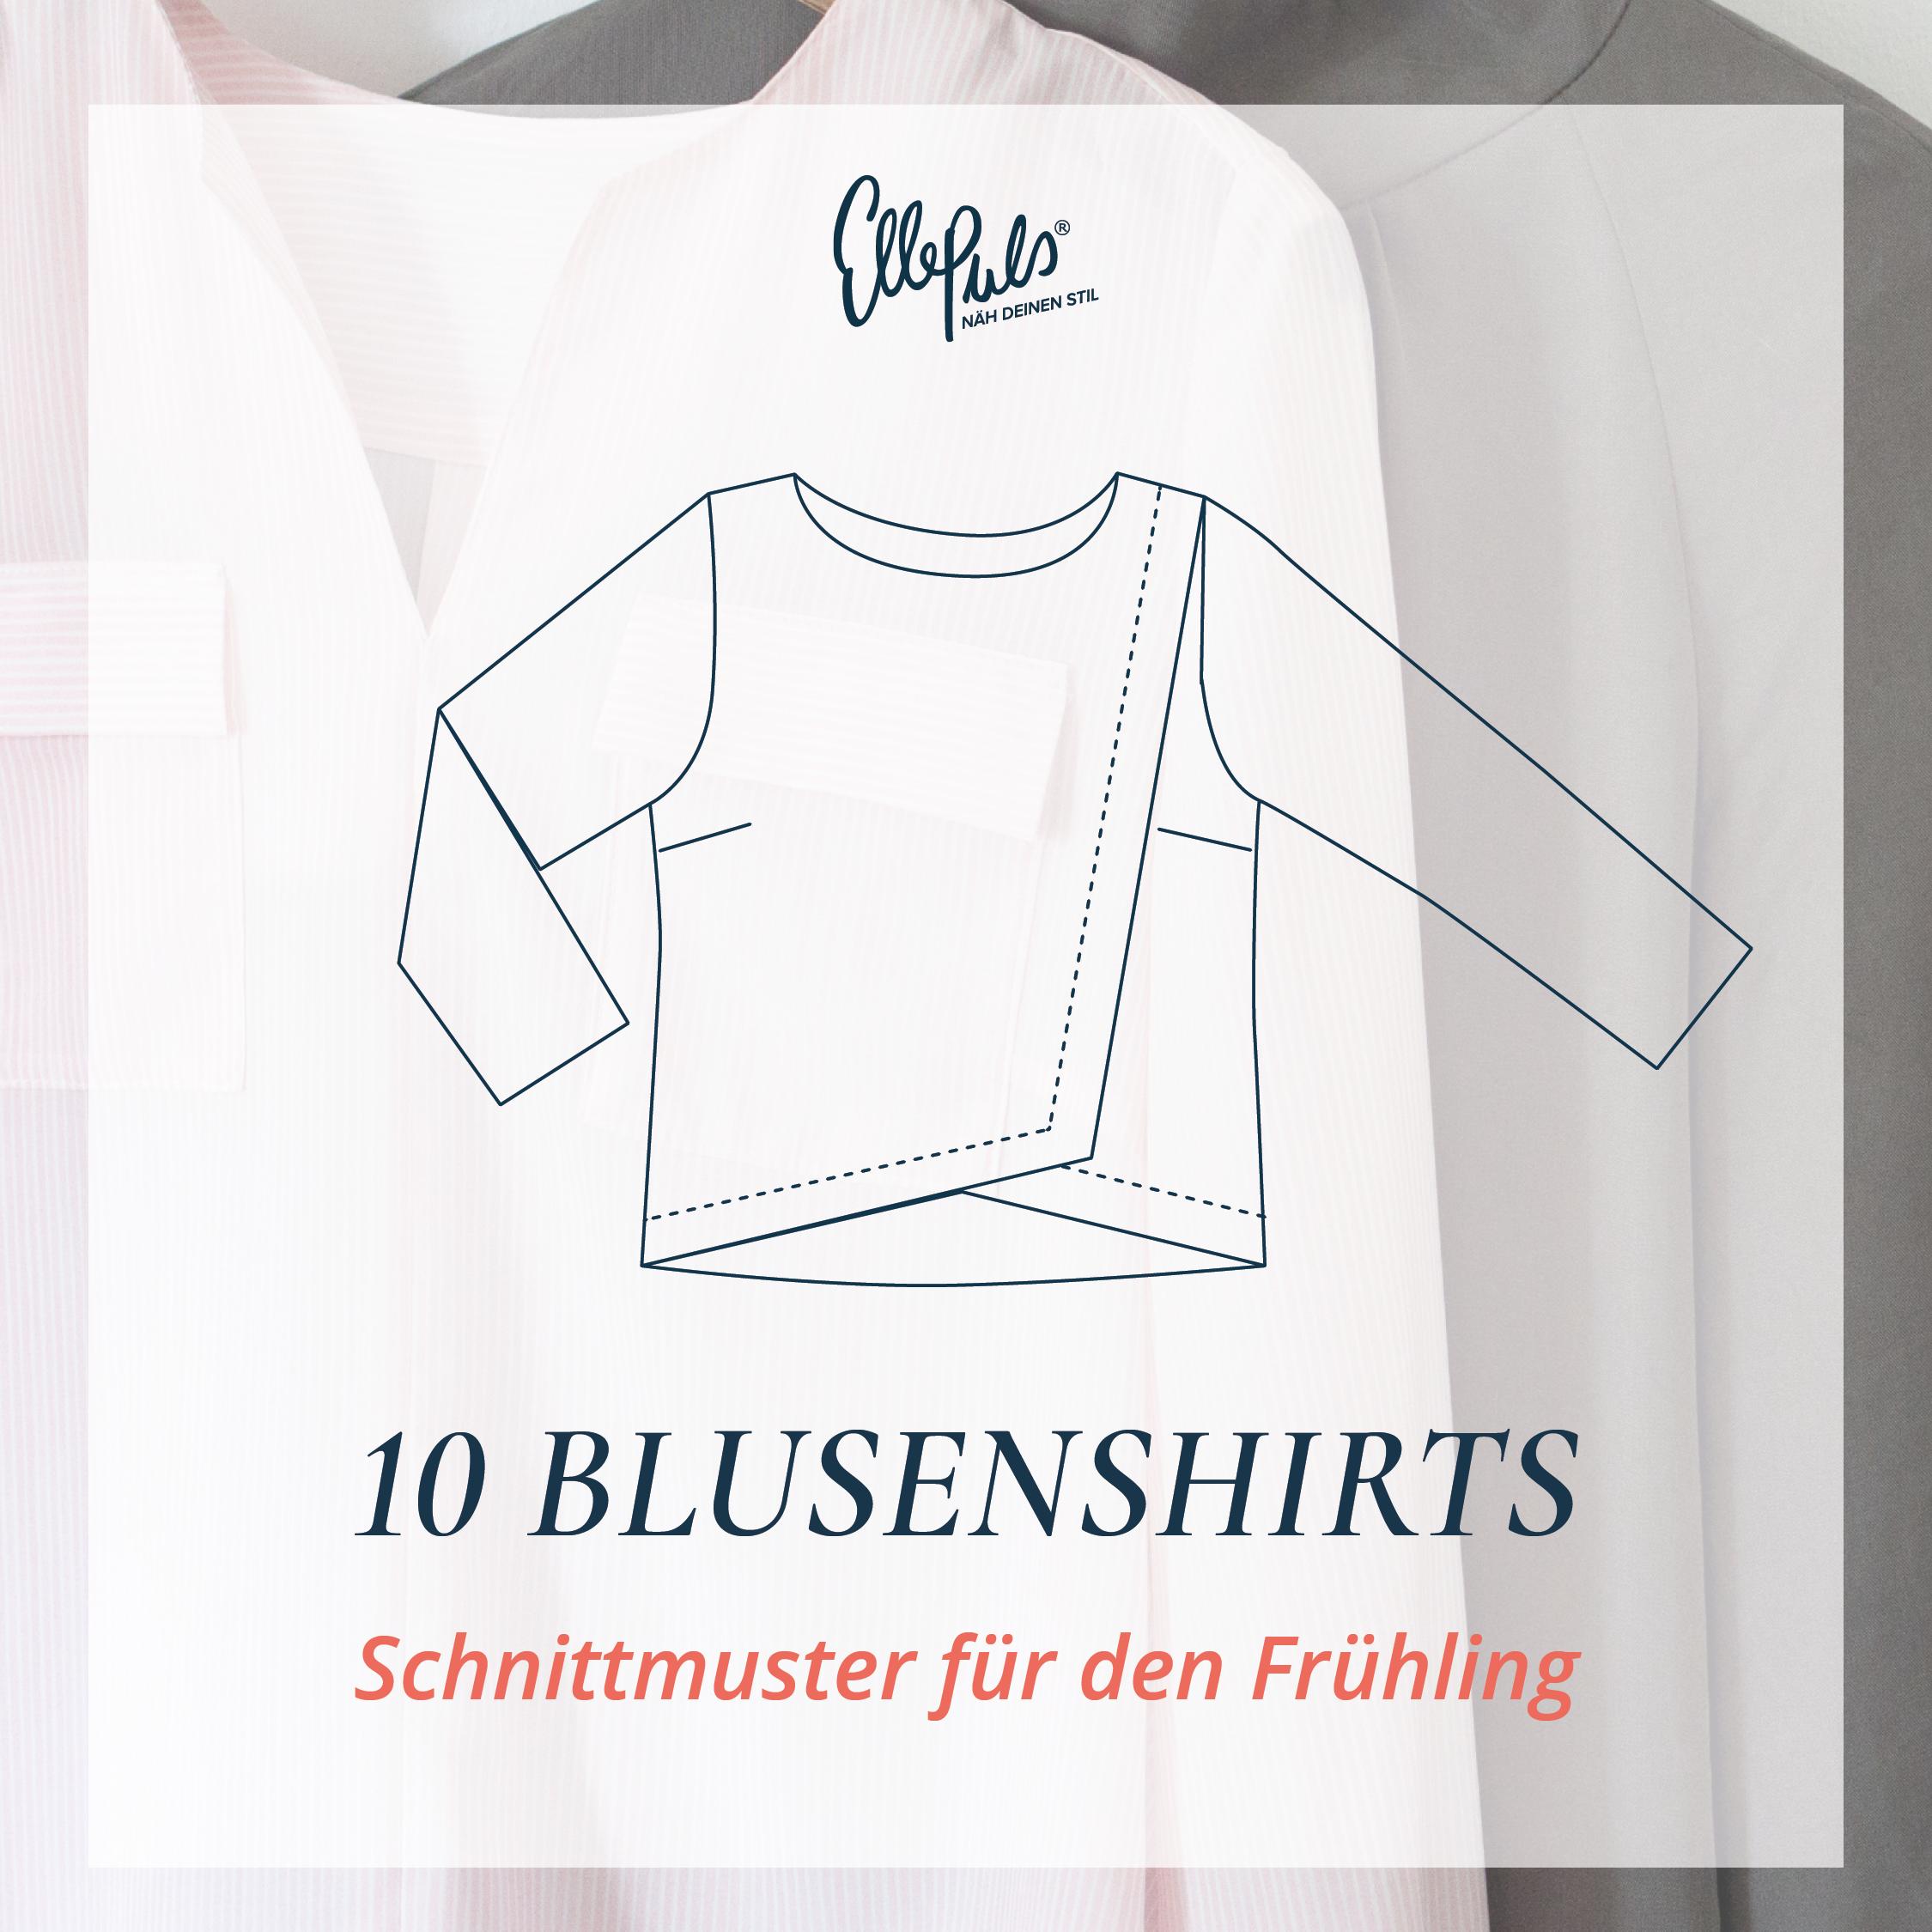 10 Blusenshirt Schnittmuster für den Frühling